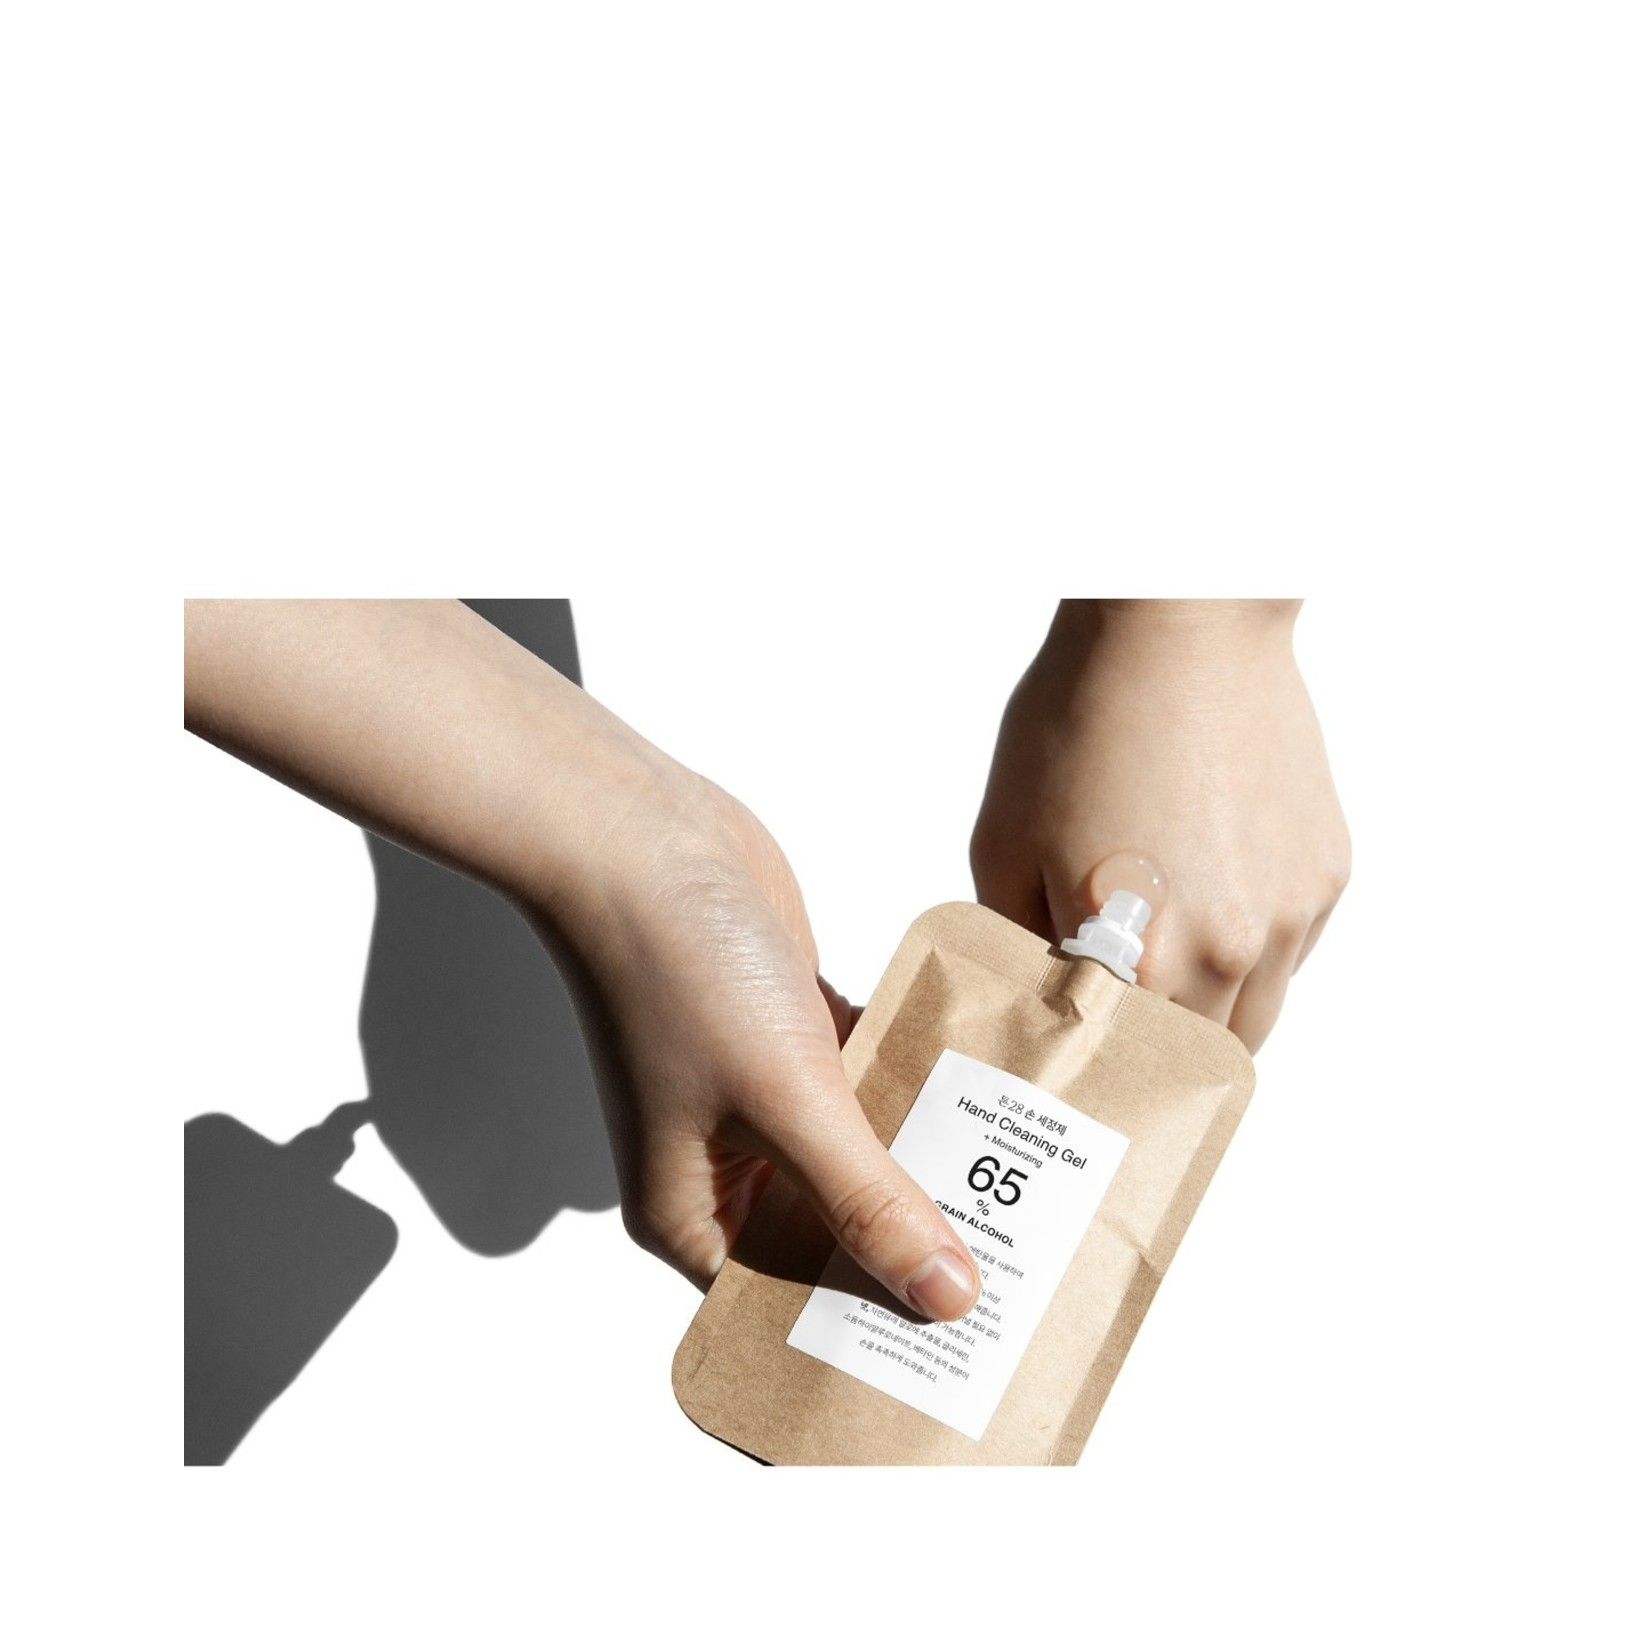 TOUN28 Hand Cleaning Gel 60ml